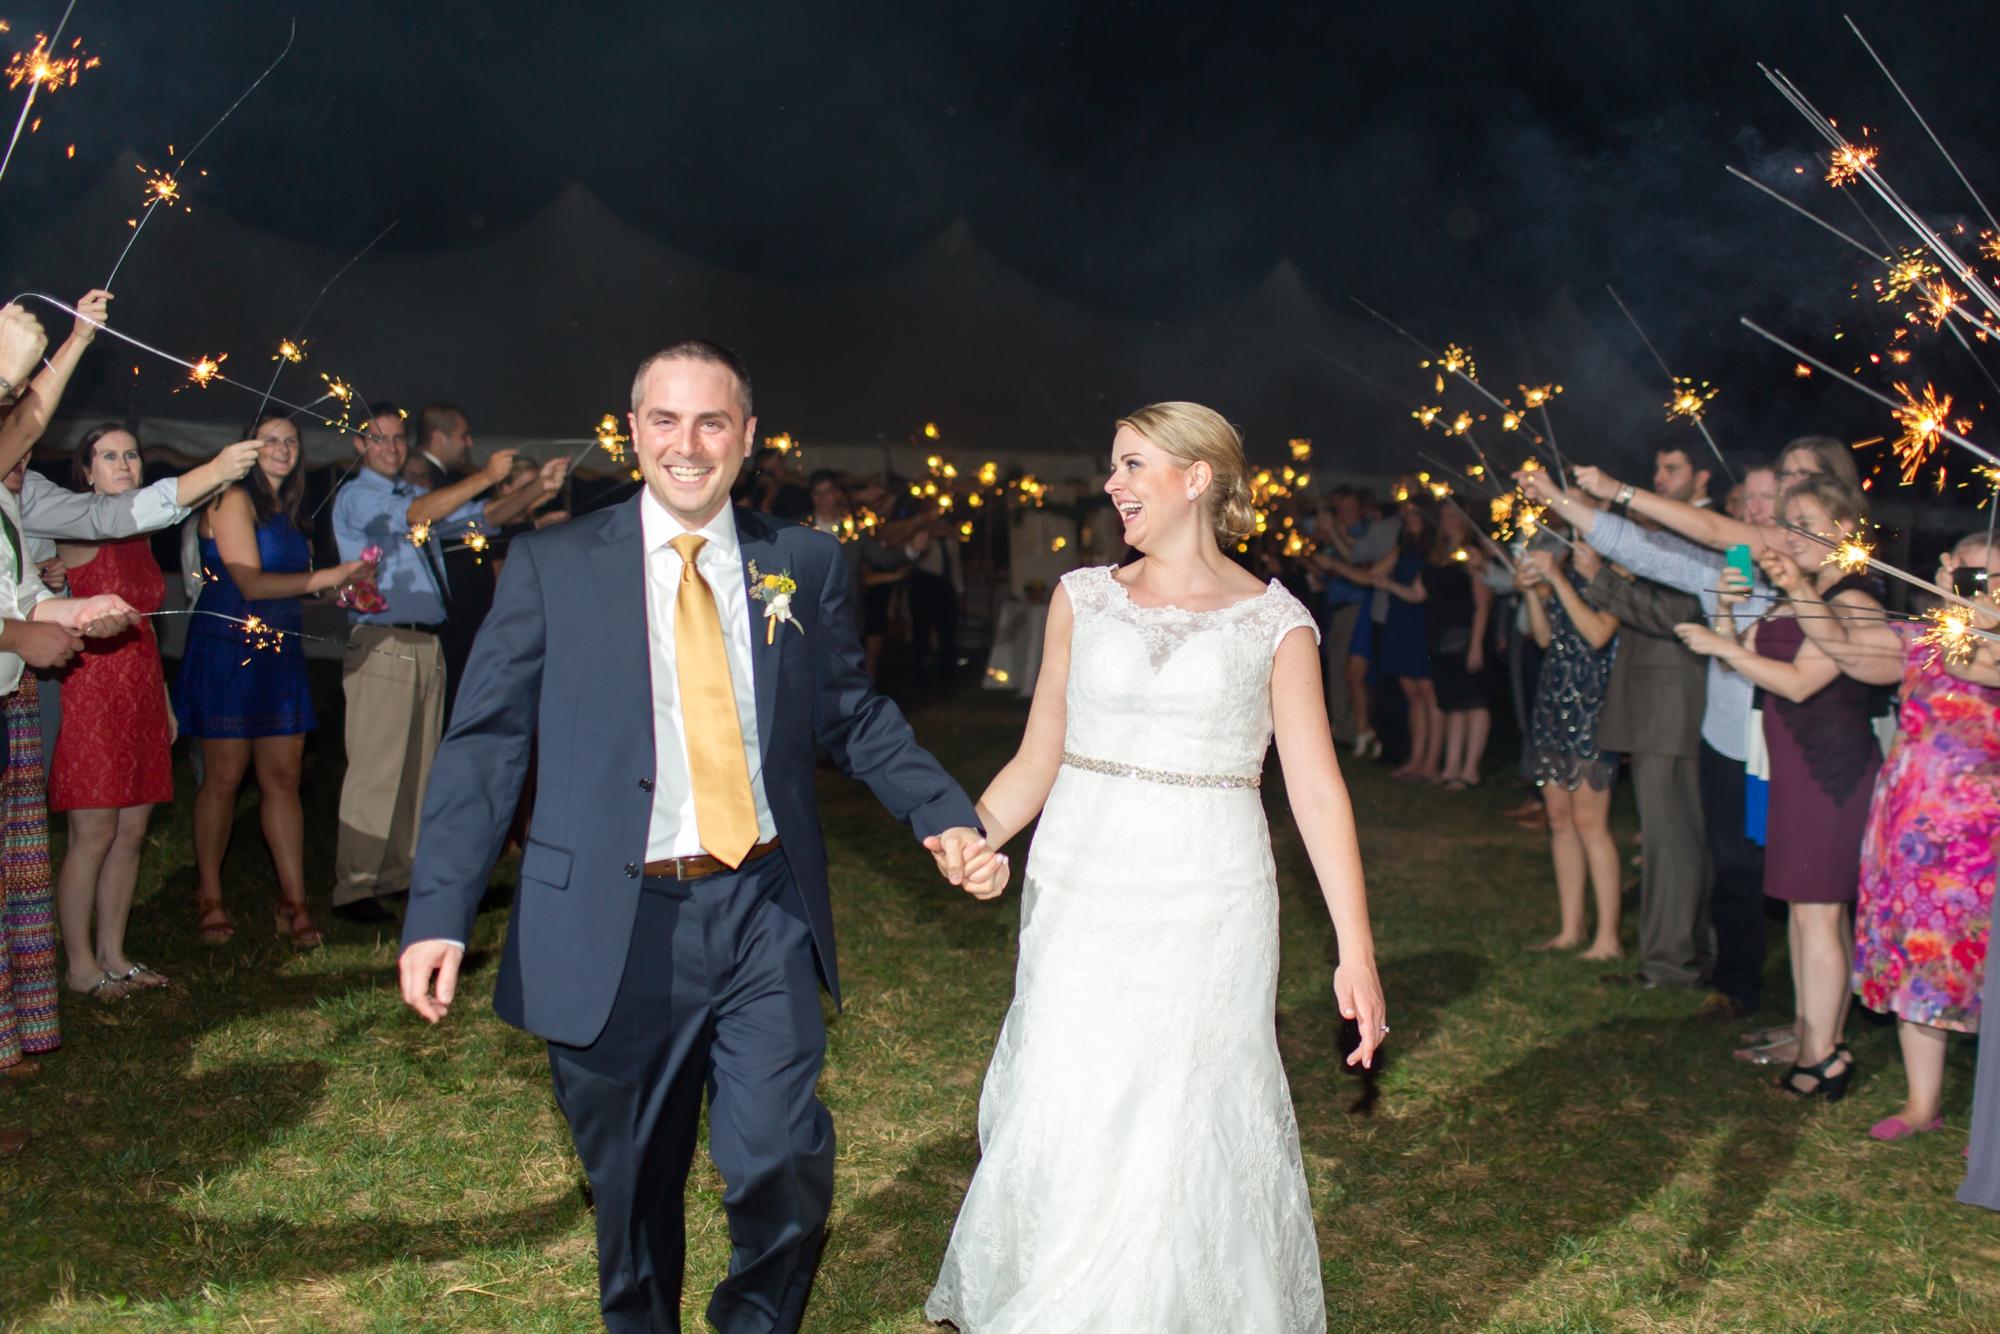 7-Miano Wedding Reception-1045_anna grace photography maryland wedding photographer rockland estates.jpg